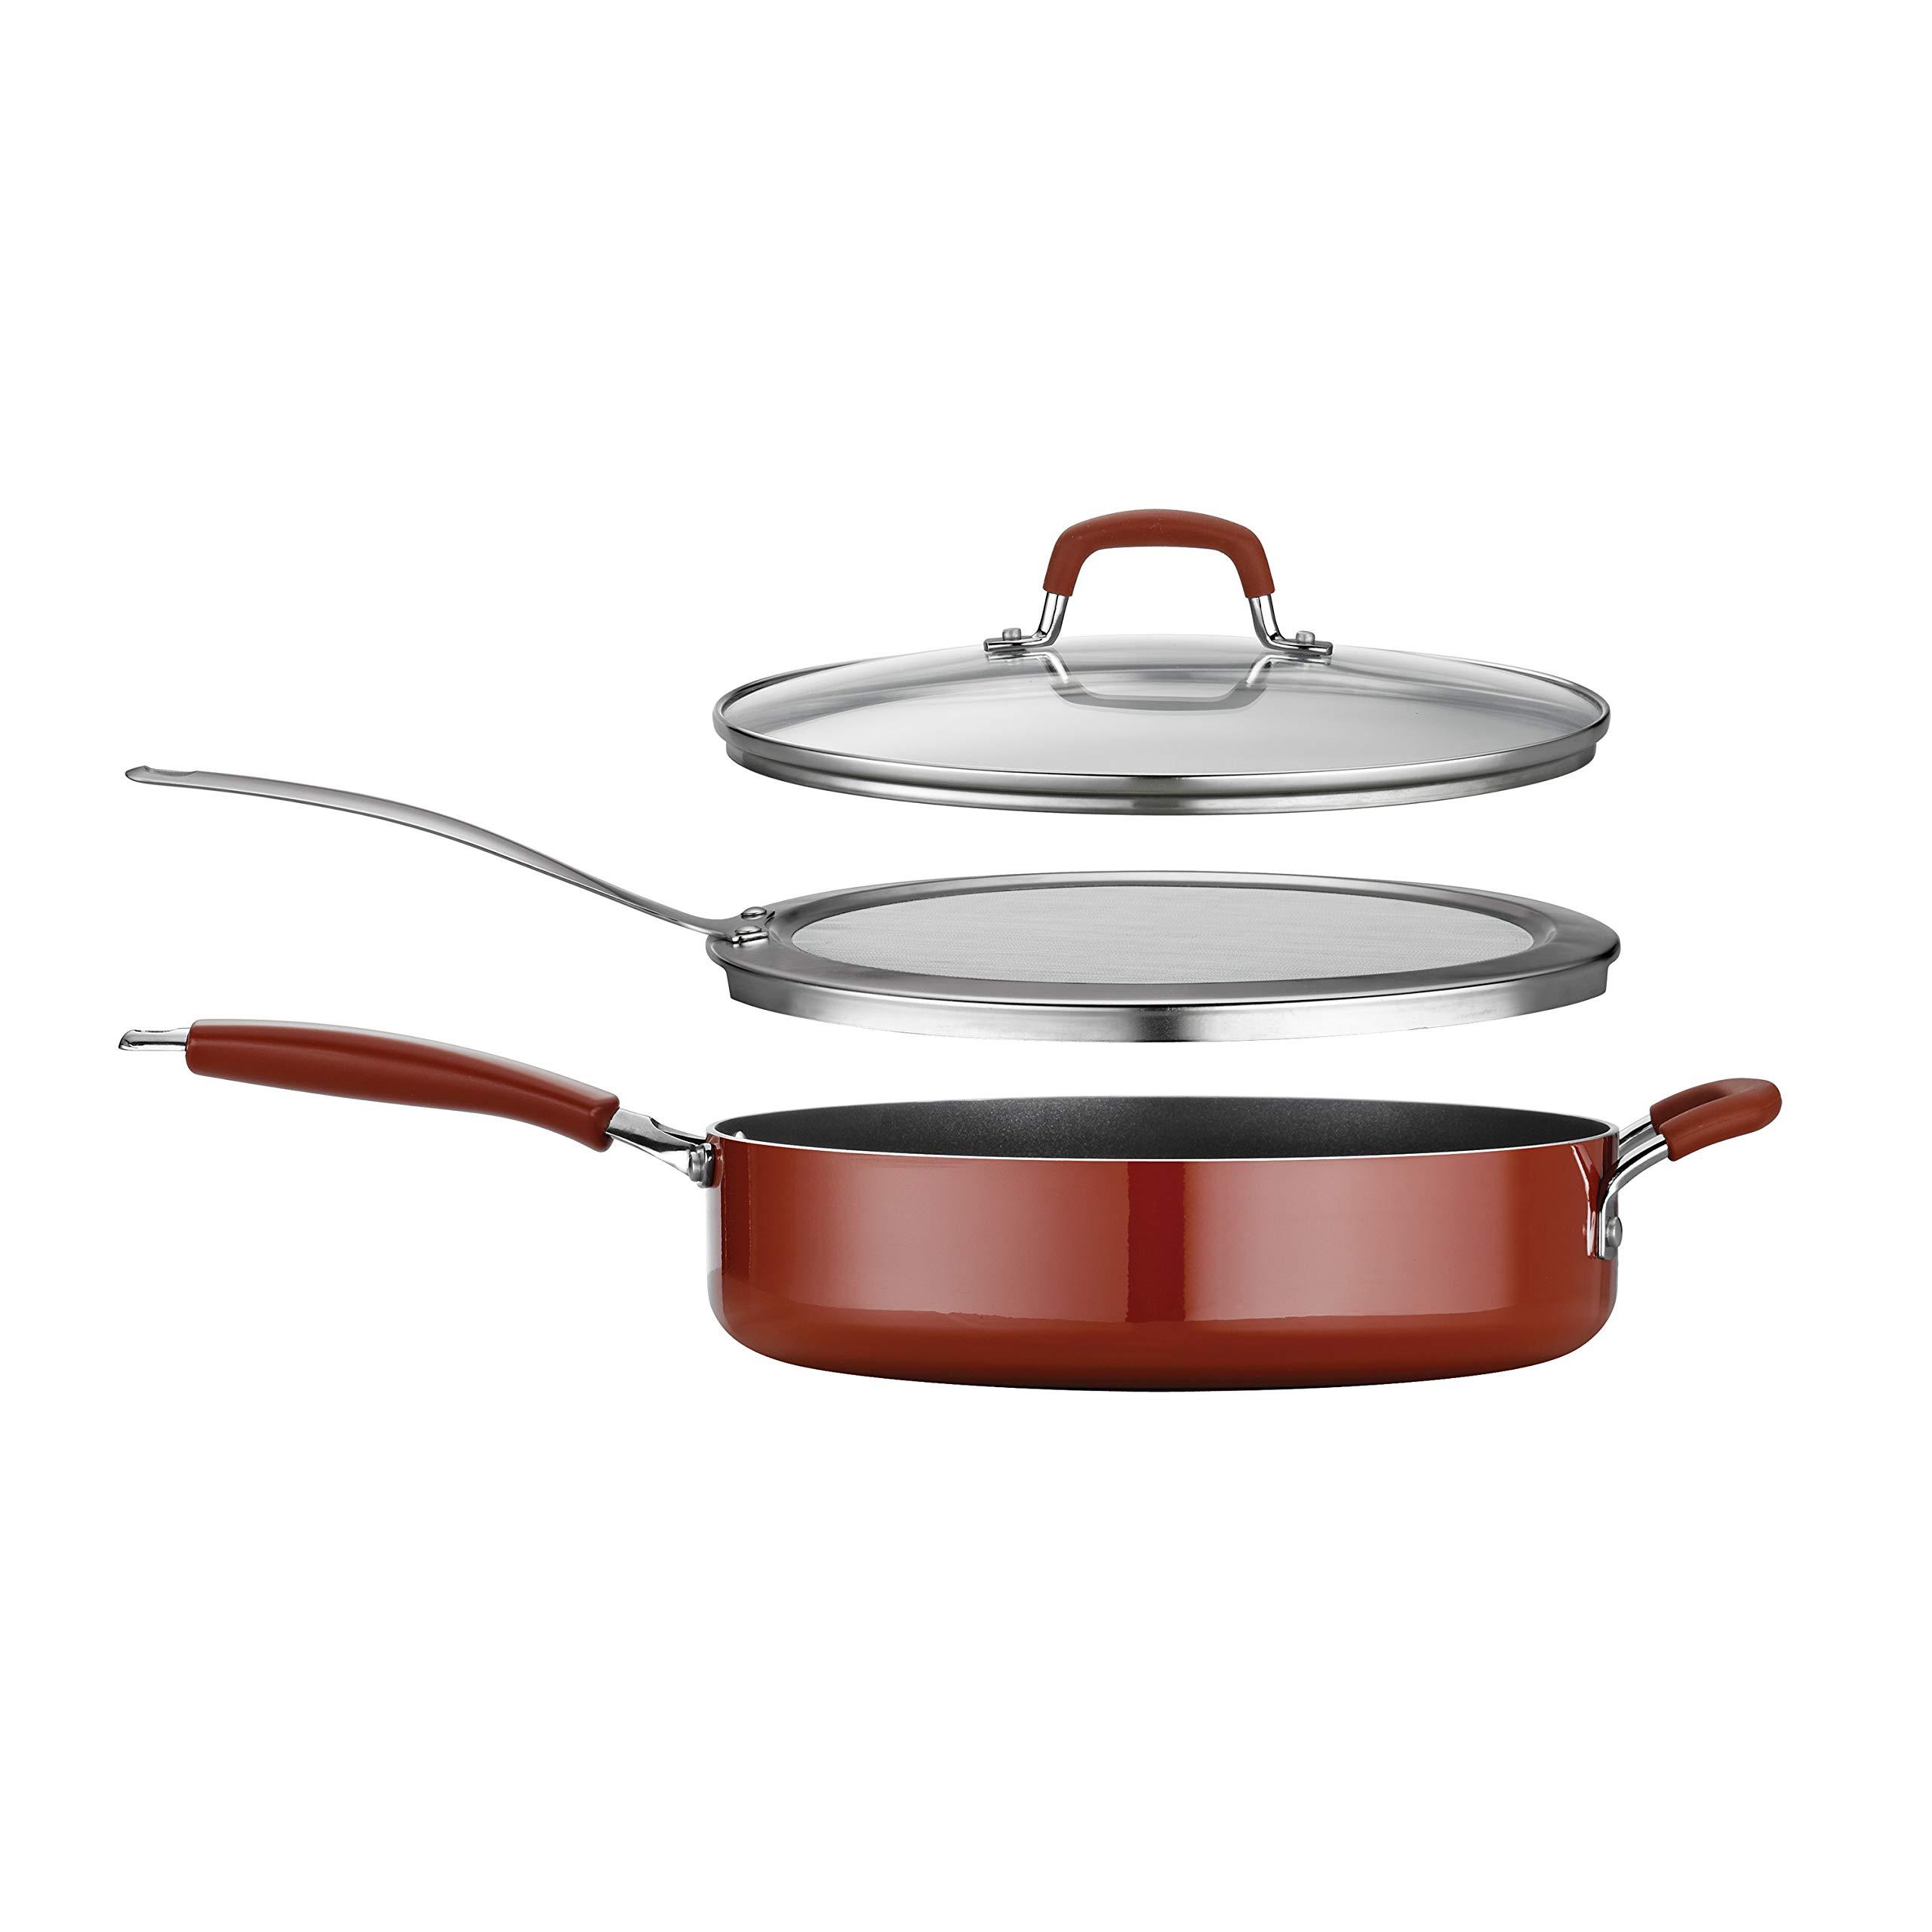 Tramontina 80151/504 Simple Cooking Aluminum Red Handles, 3 Piece, Porcelain Enamel Deep Saute Set, Spice by Tramontina (Image #4)